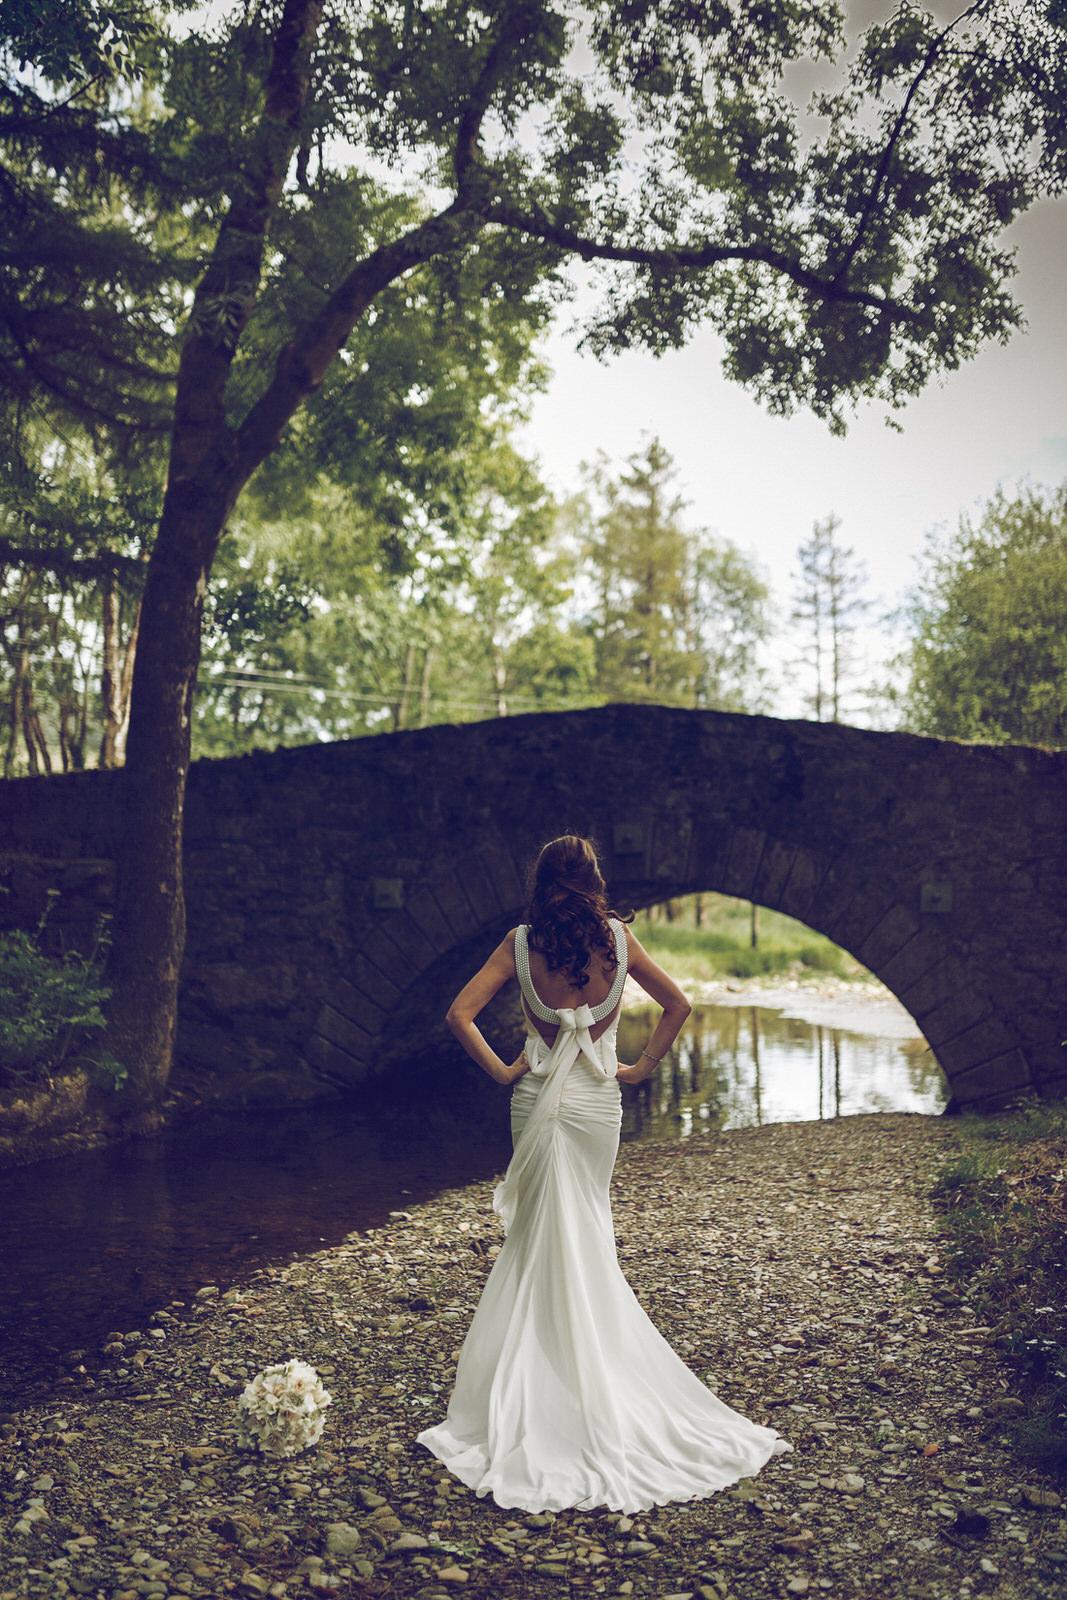 Brooklodge-wicklow-wedding-photographer_081.jpg